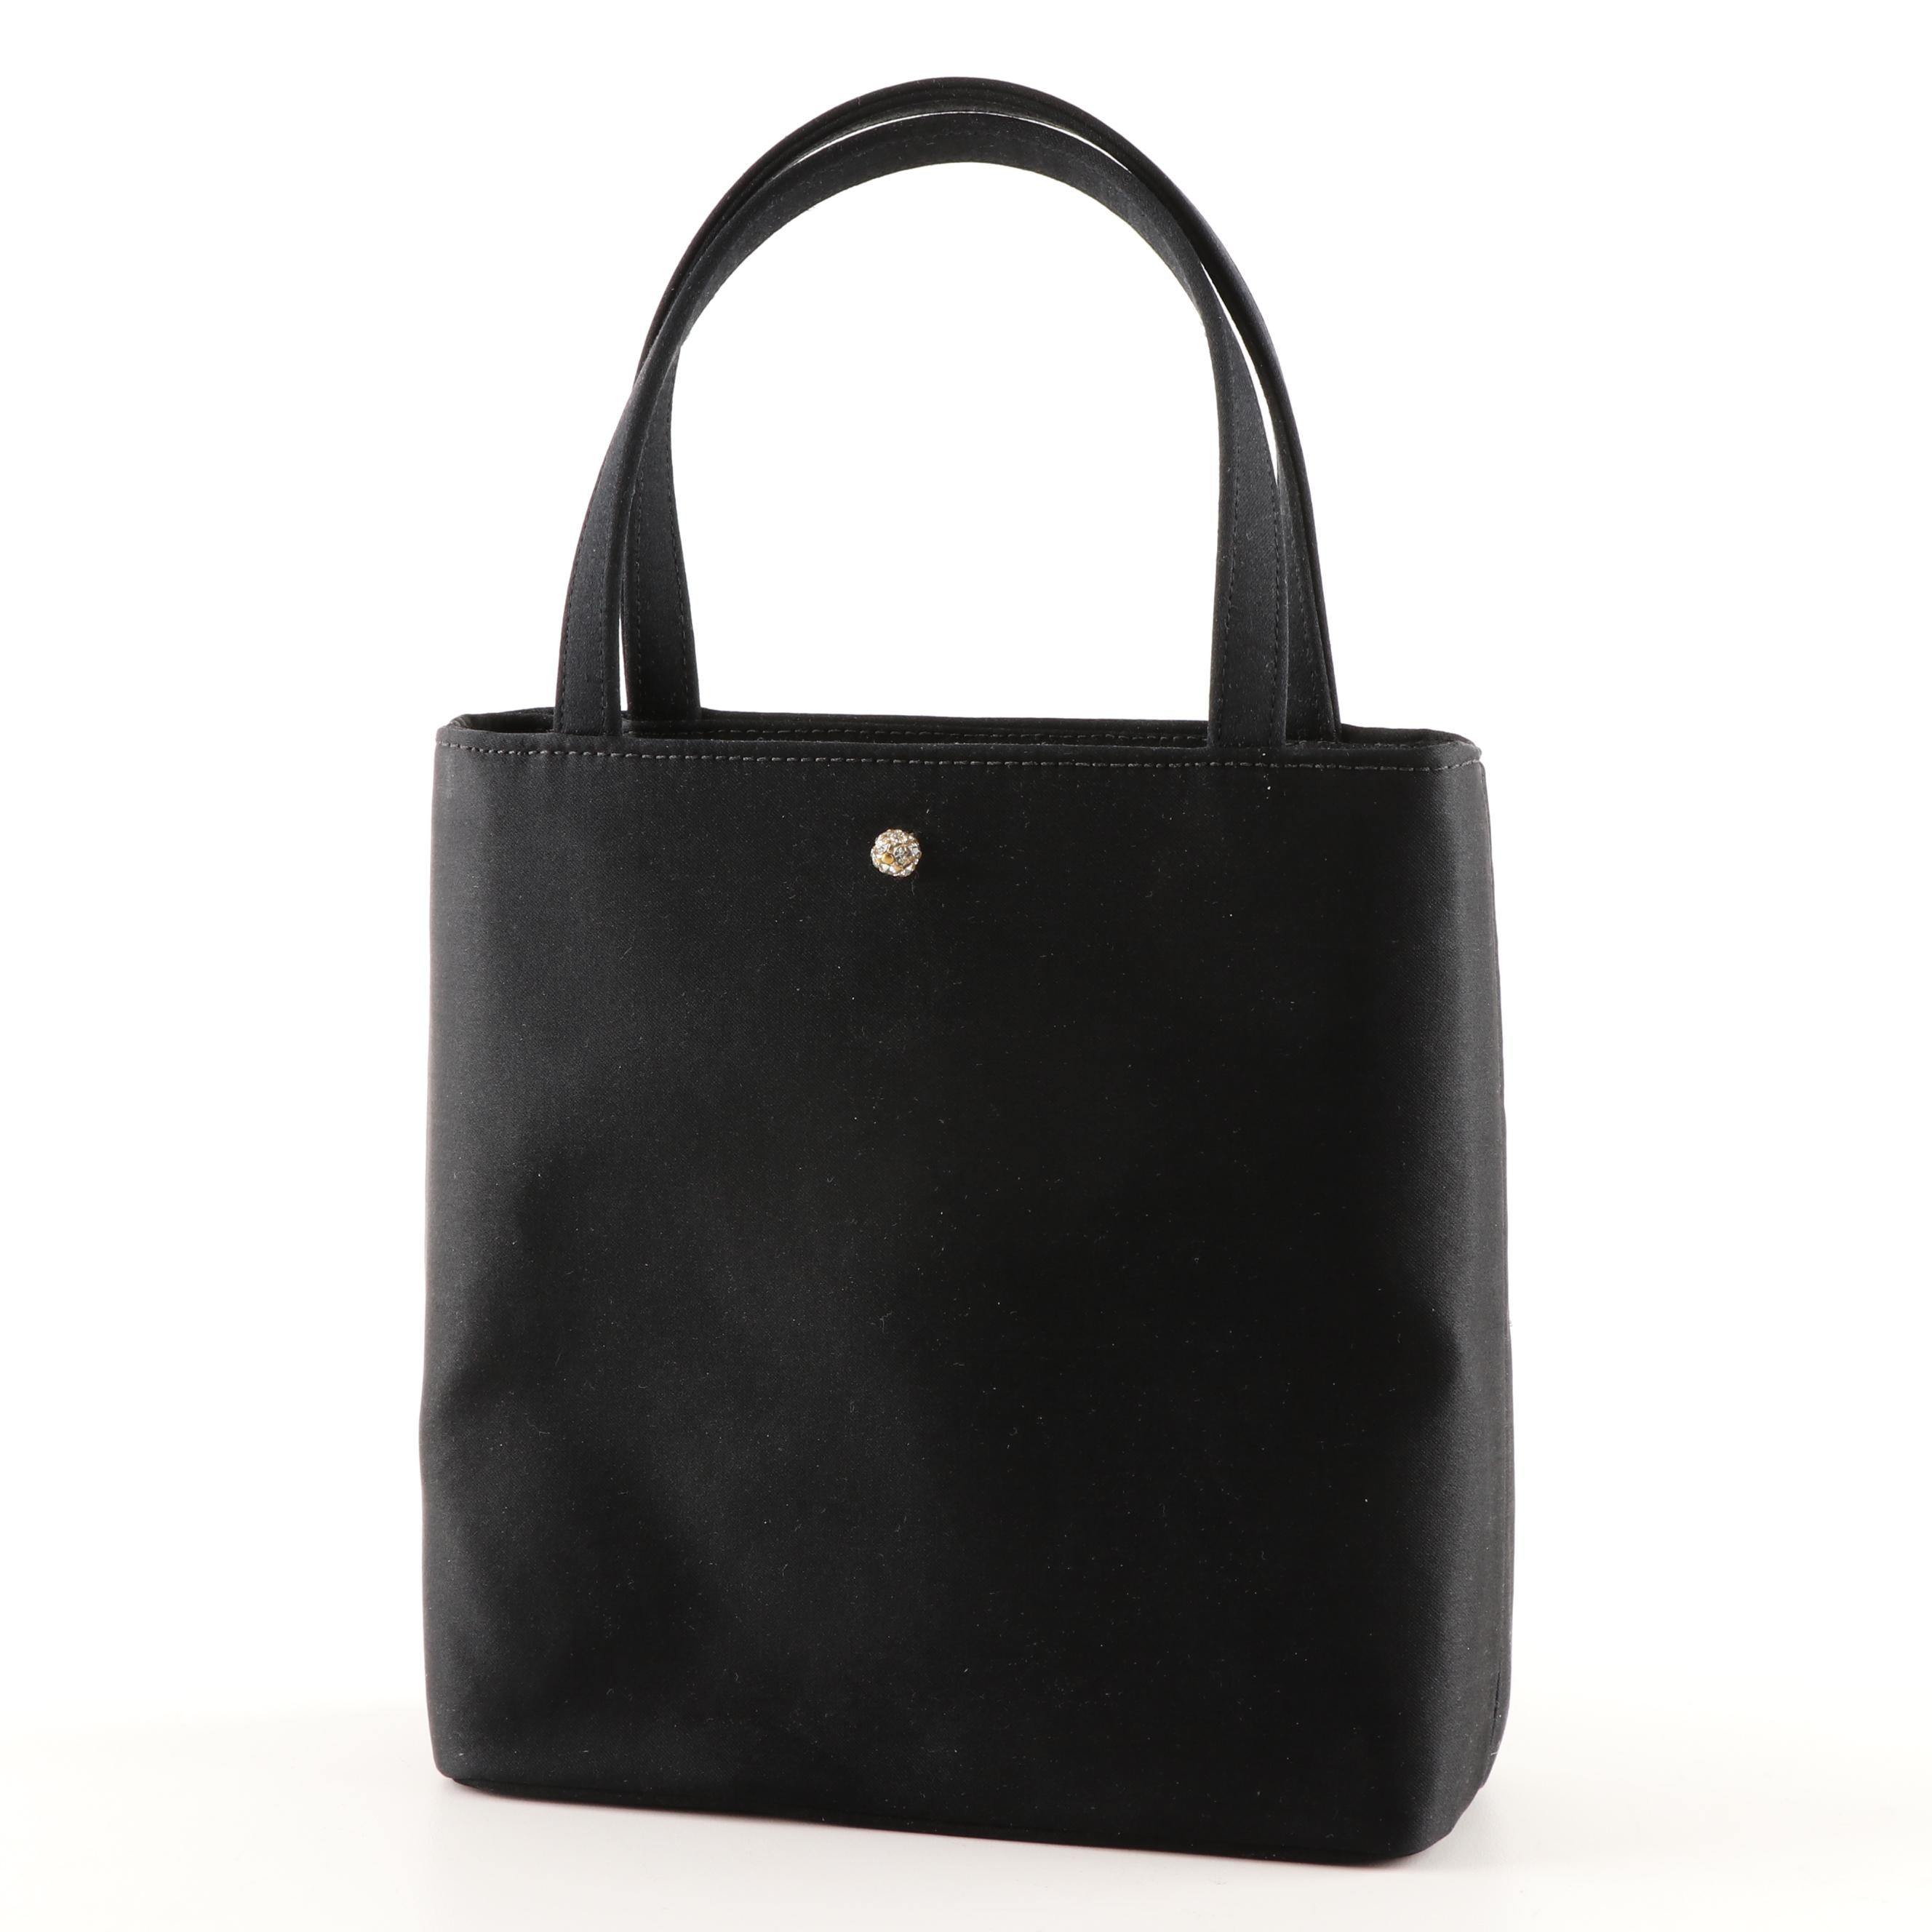 Kate Spade New York Black Fabric Shoulder Bag